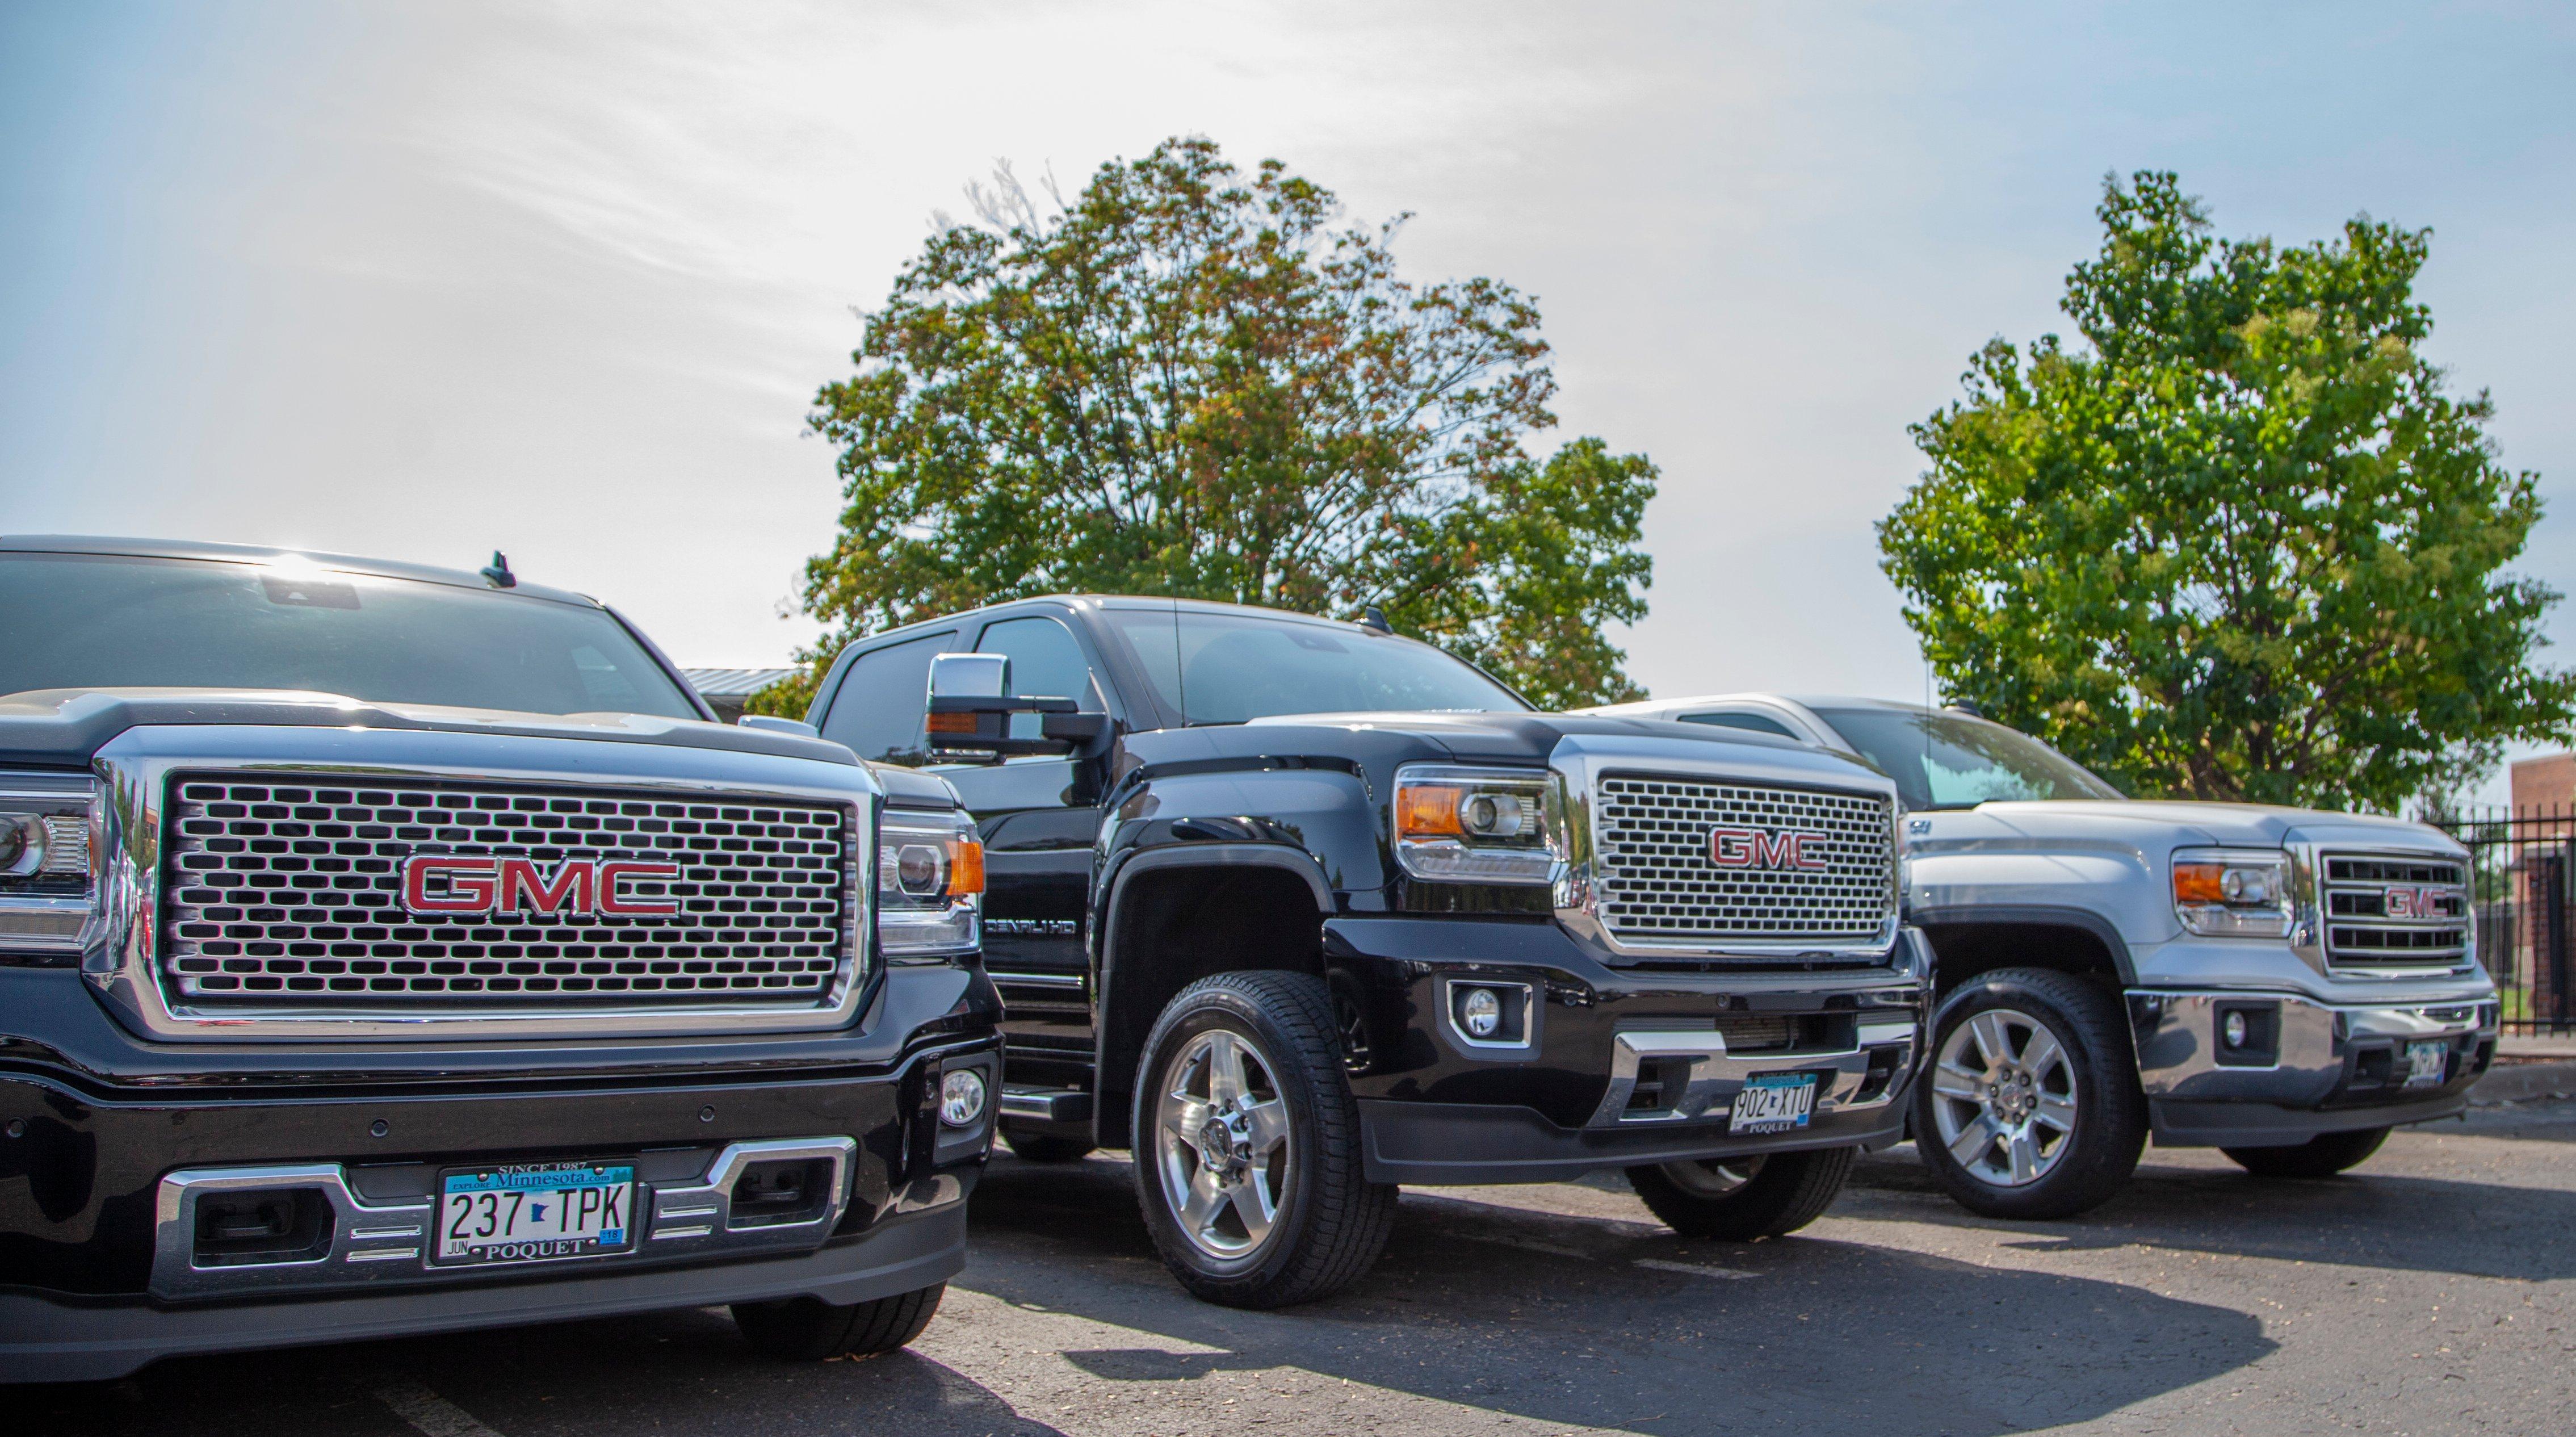 4wd-awd-trucks-poquet-1